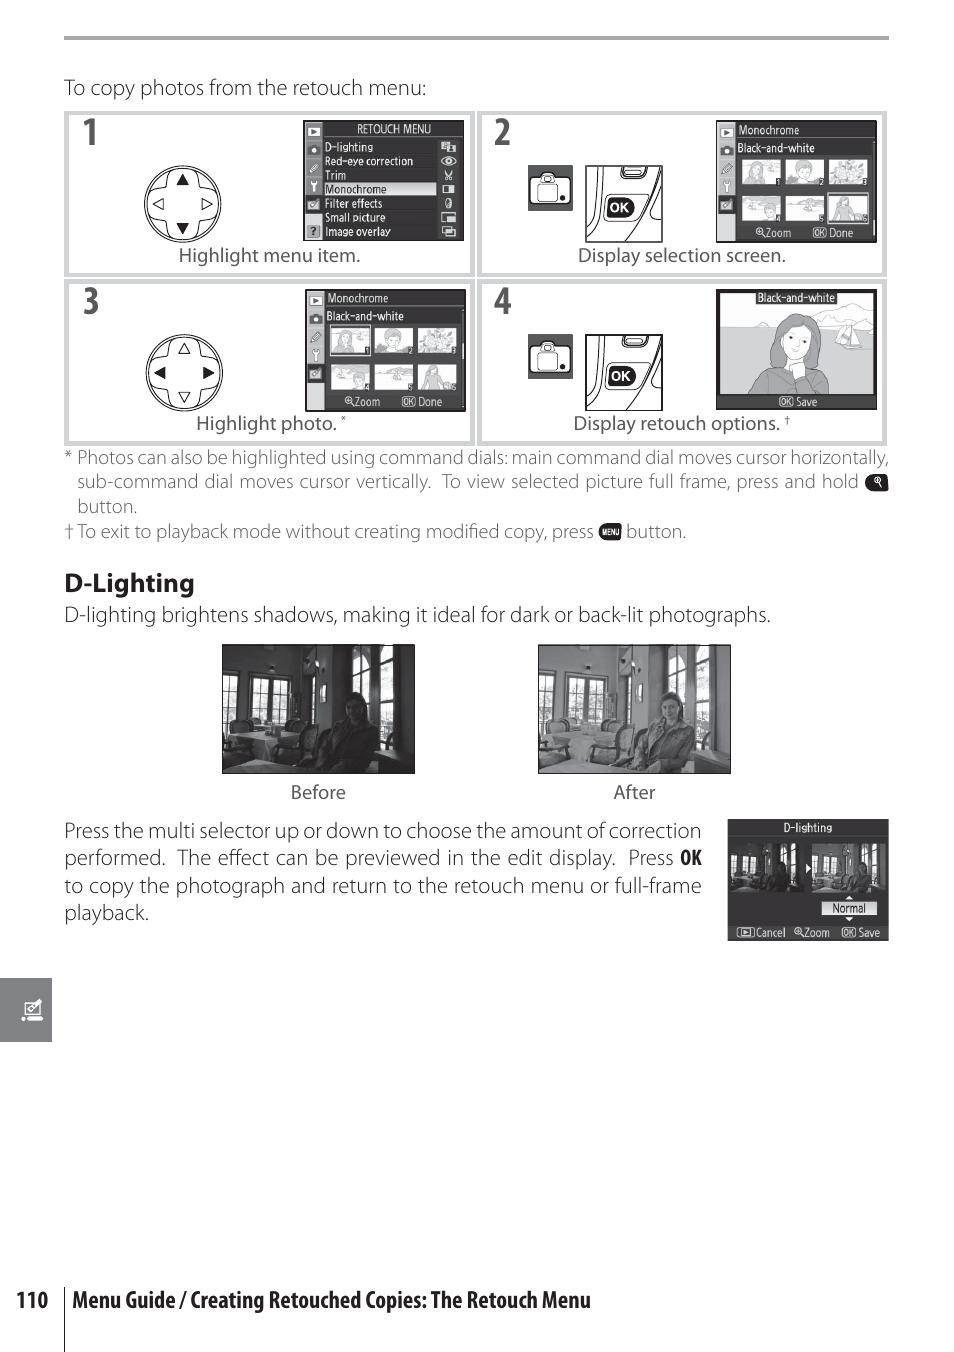 d lighting nikon d80 user manual page 122 162 original mode rh manualsdir com nikon d80 user manual nikon d80 user manual